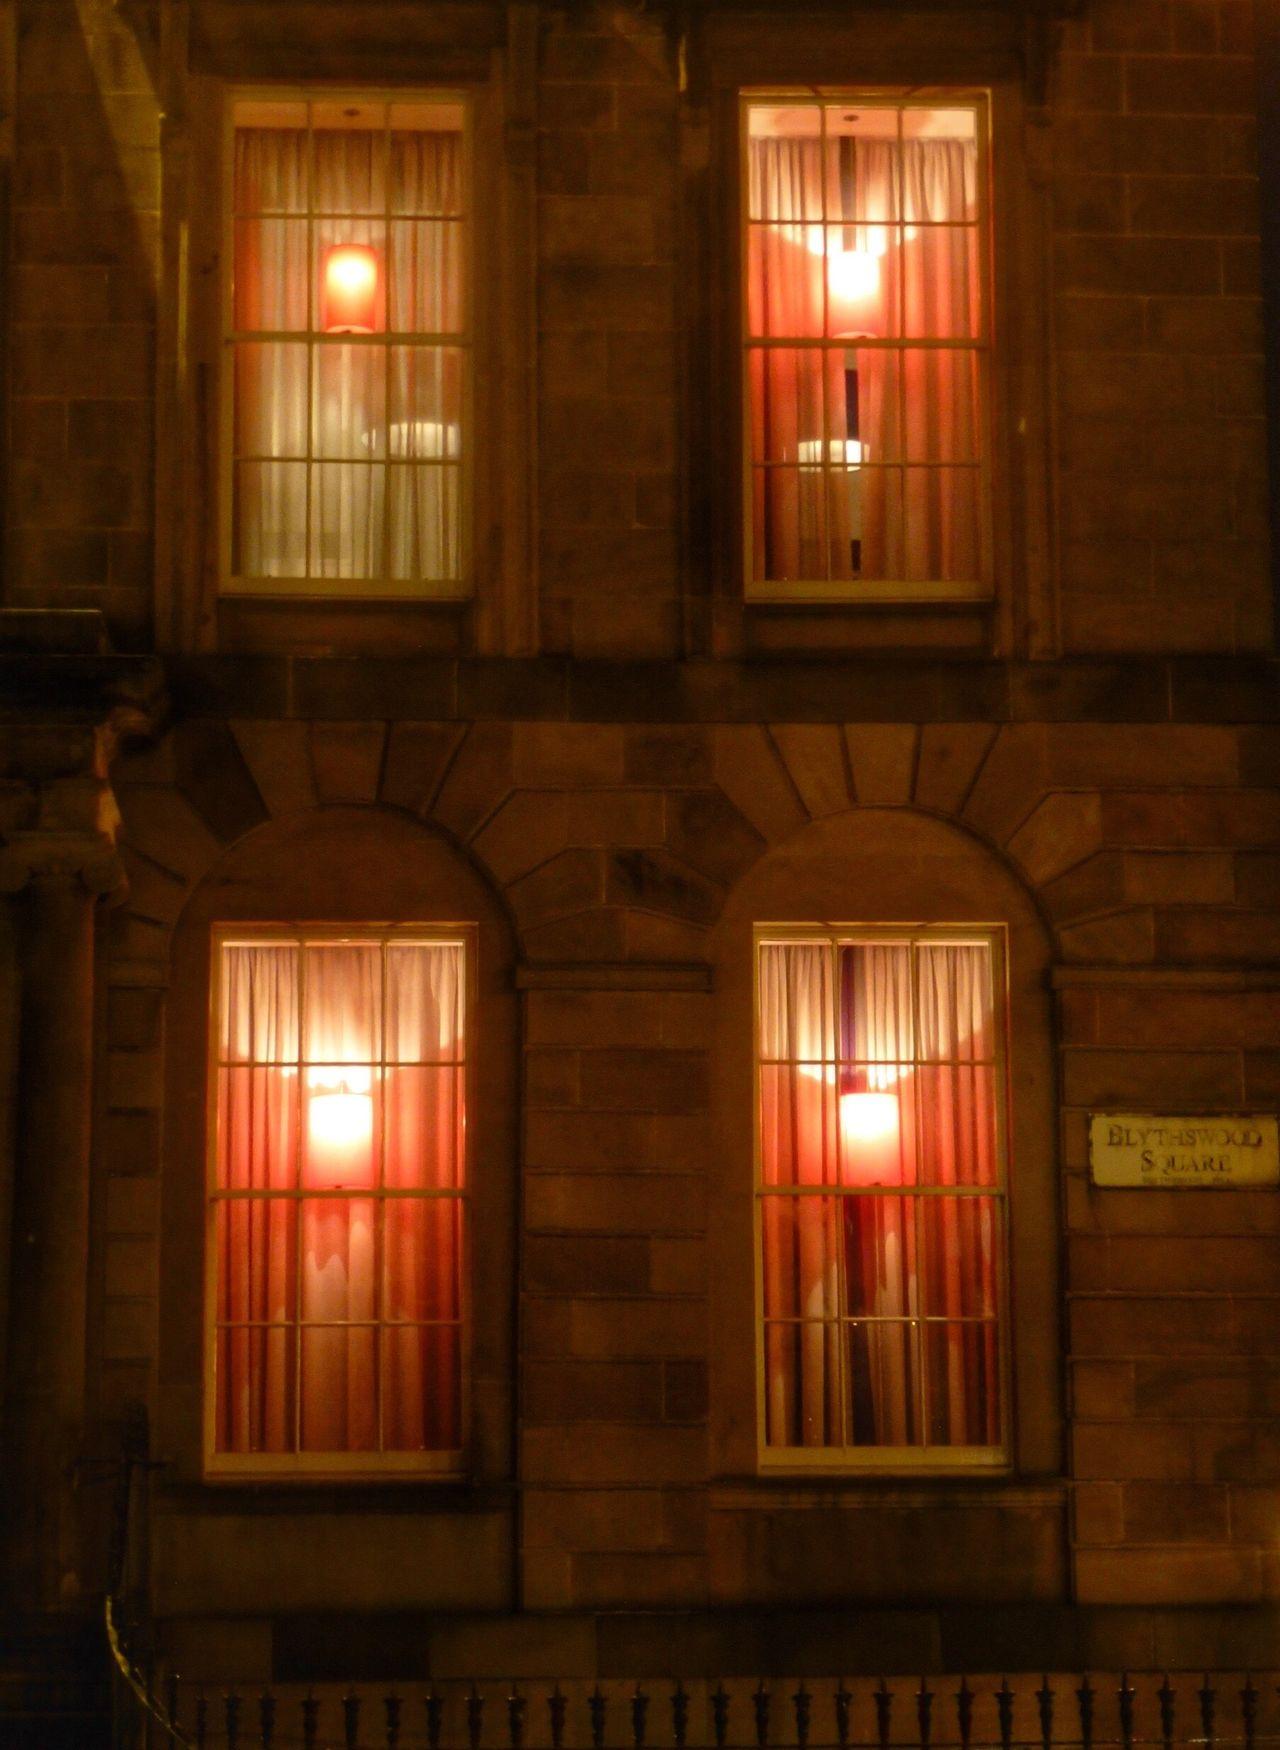 Learn & Shoot: After Dark EyeEm Gallery EyeEm Best Shots Glasgow At Night Colorful EyeEmBestPics Eye4photography  Scotland Life Nightphotography Scotland 💕 Colors Glasgow Hotel Blythswood Hotel Red